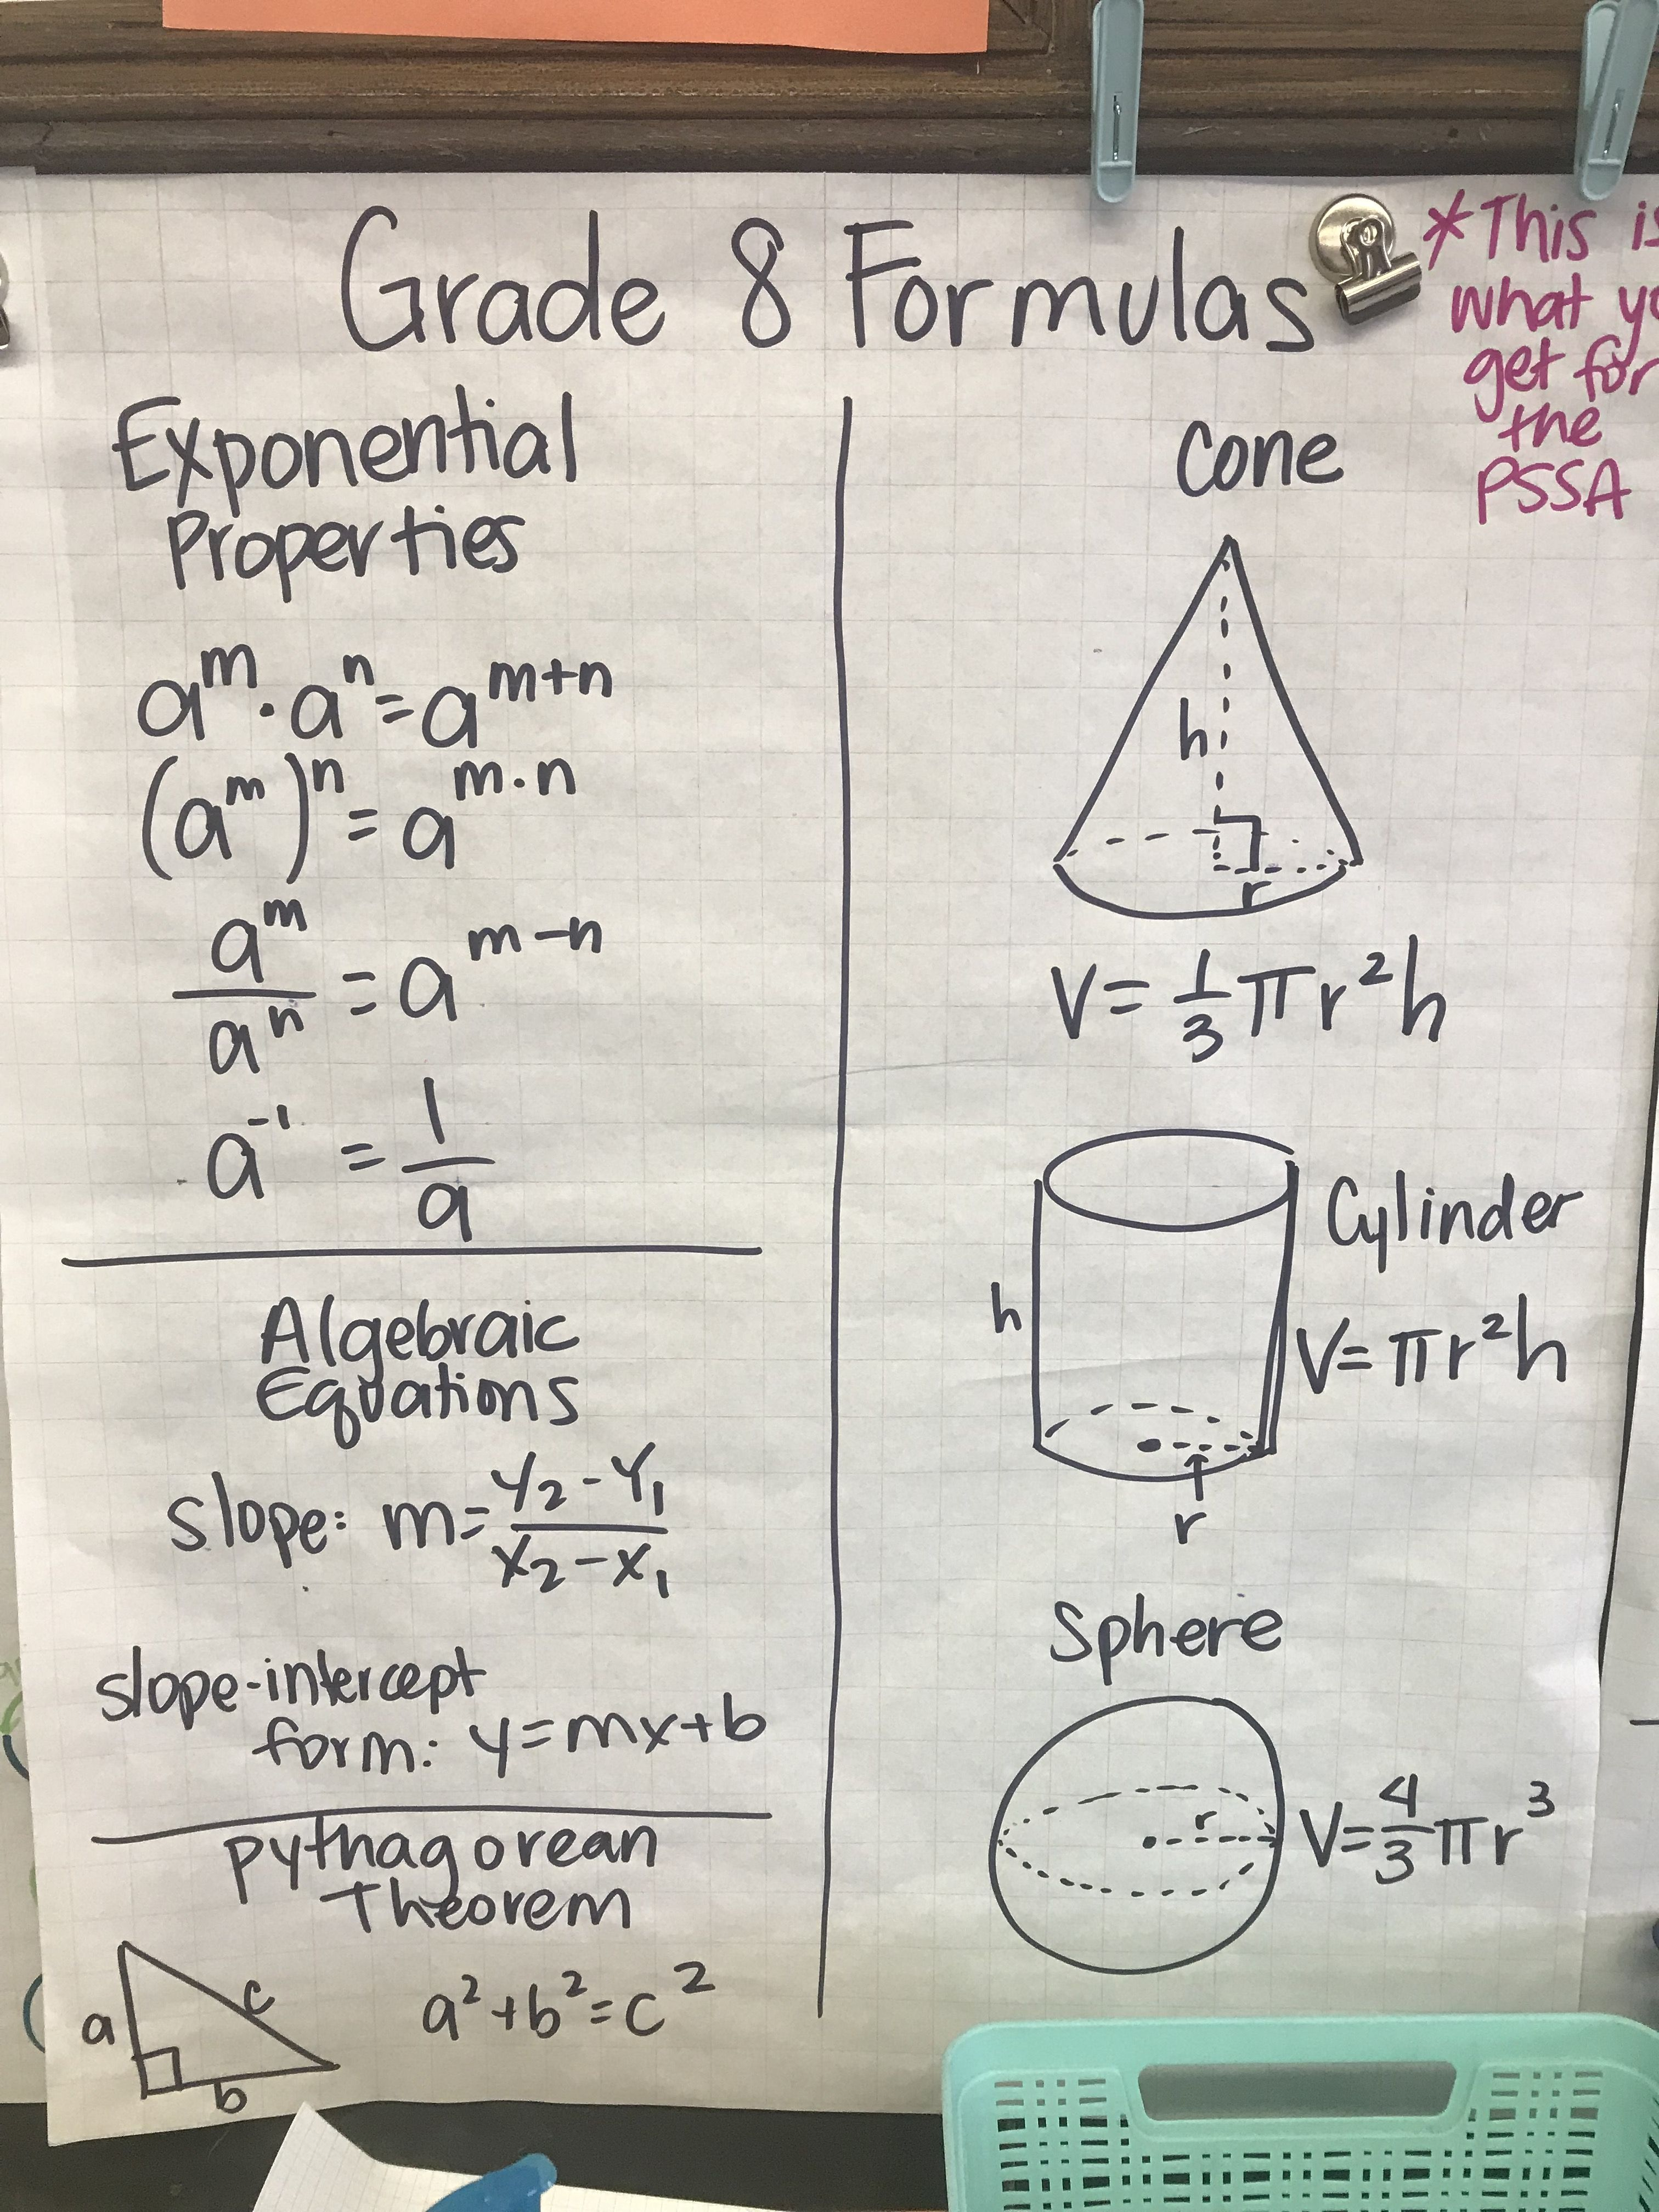 small resolution of PSSA 8th Grade Formula Sheet anchor chart (photo only)   8th grade math